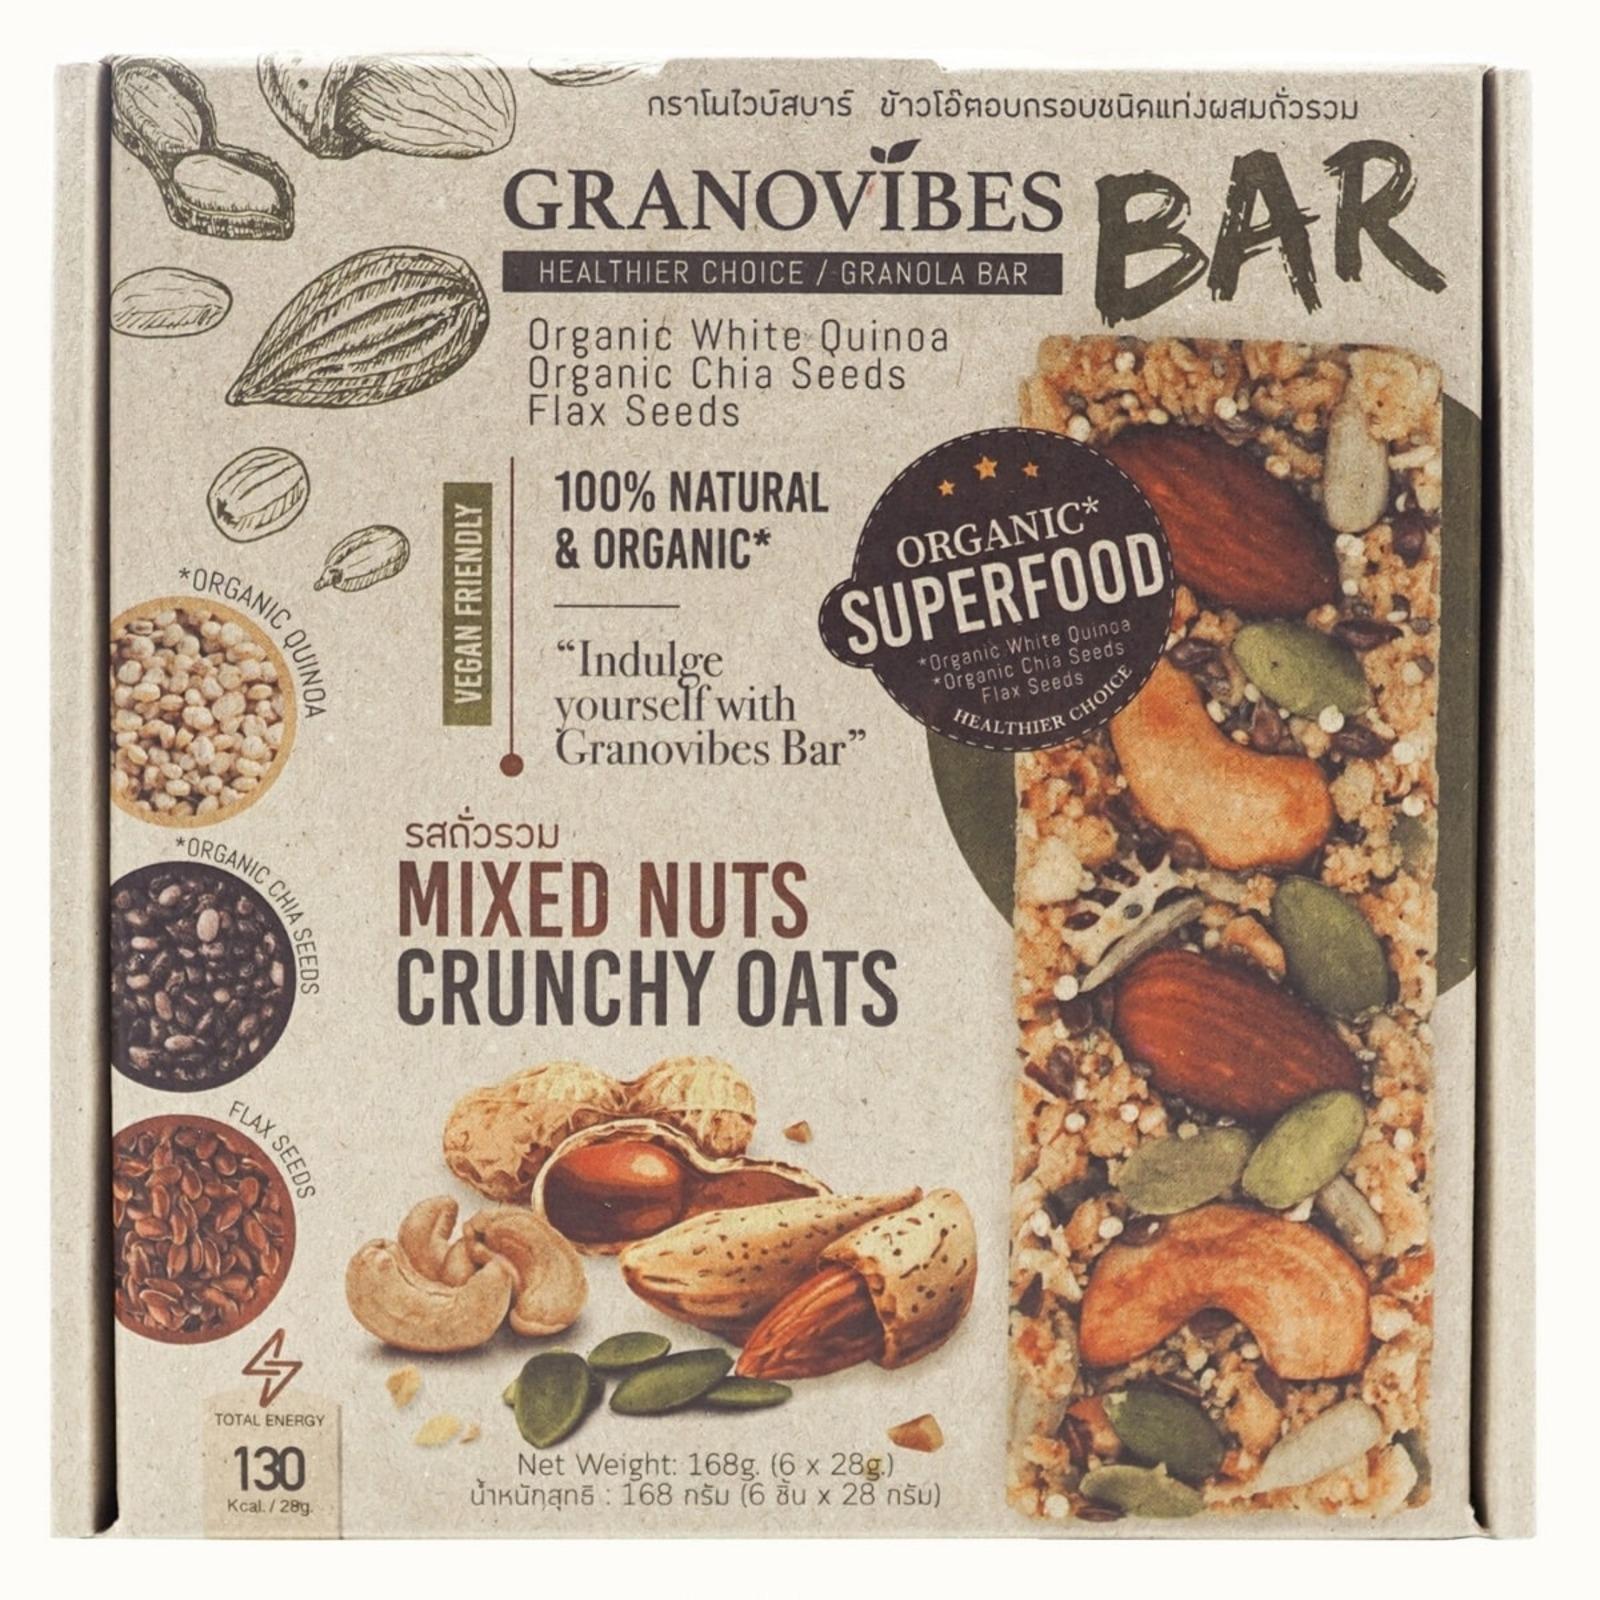 Granovibes Bar - Mixed Nuts Crunchy Oats Bar